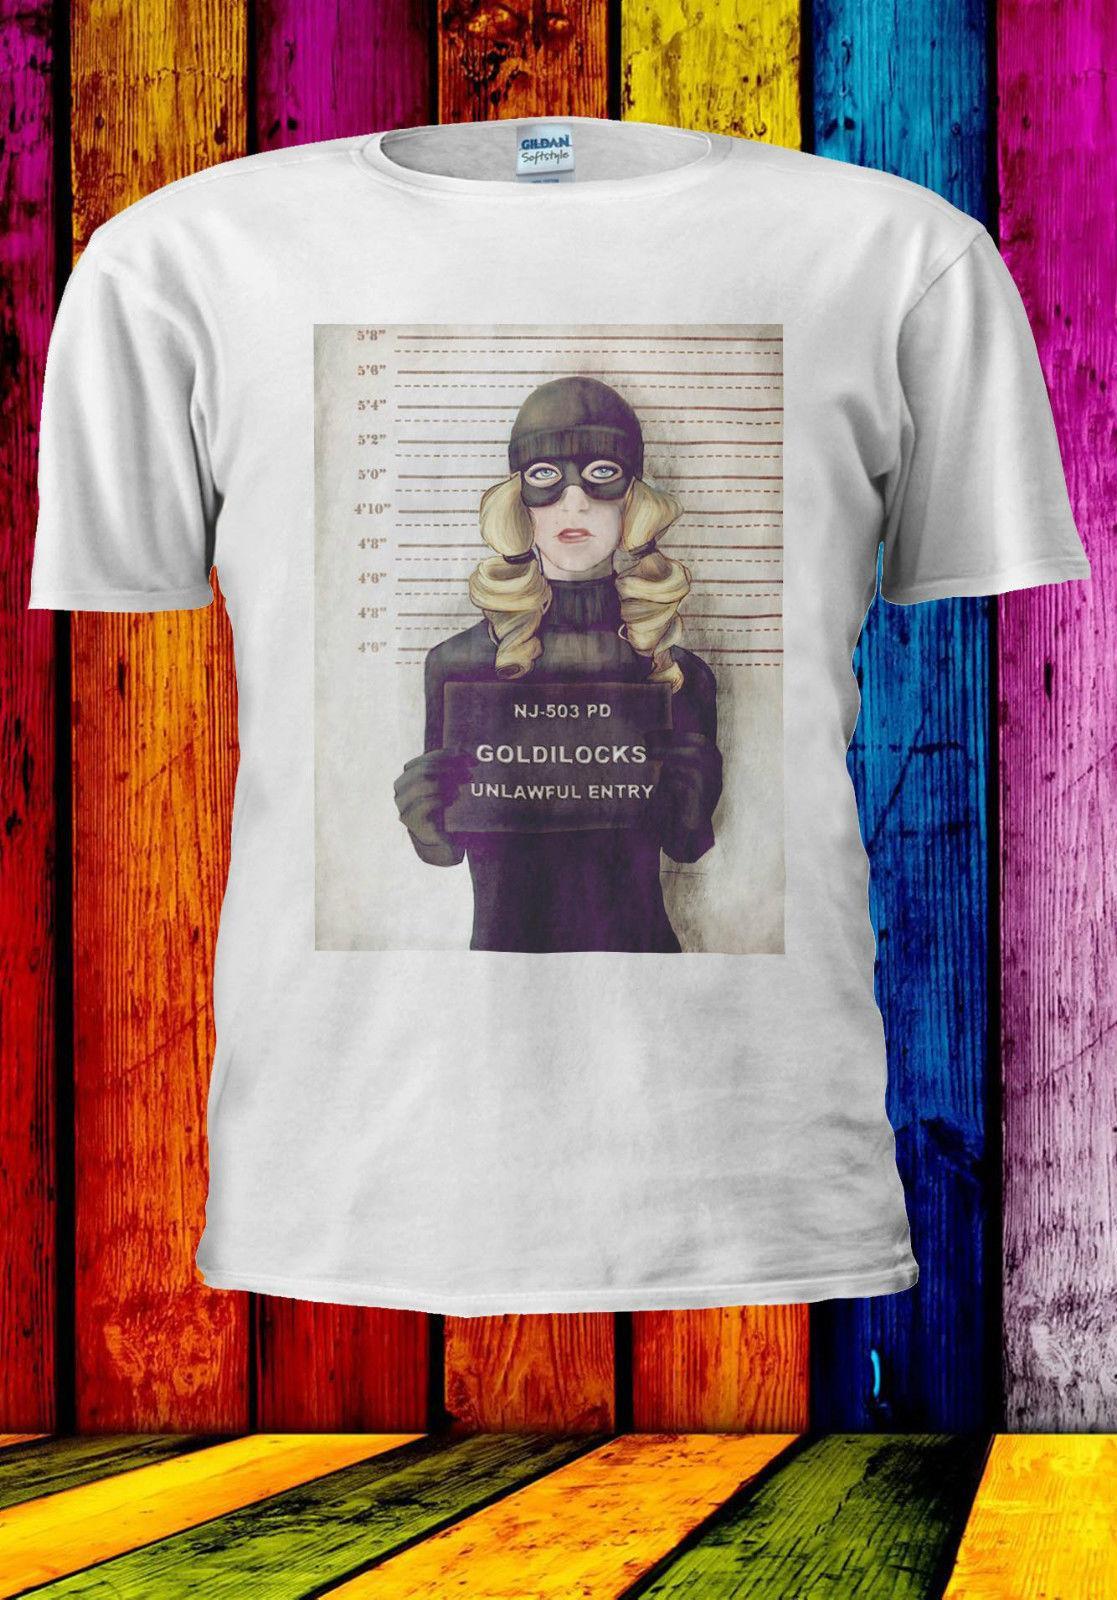 117285ec35db9e Goldilocks Three Bear Gone Bad Guilty T Shirt Vest Tank Top Men Women Unisex  528 Style Round Style Tees Custom Jersey T Shirt Great Tee Shirts Cool Tee  ...